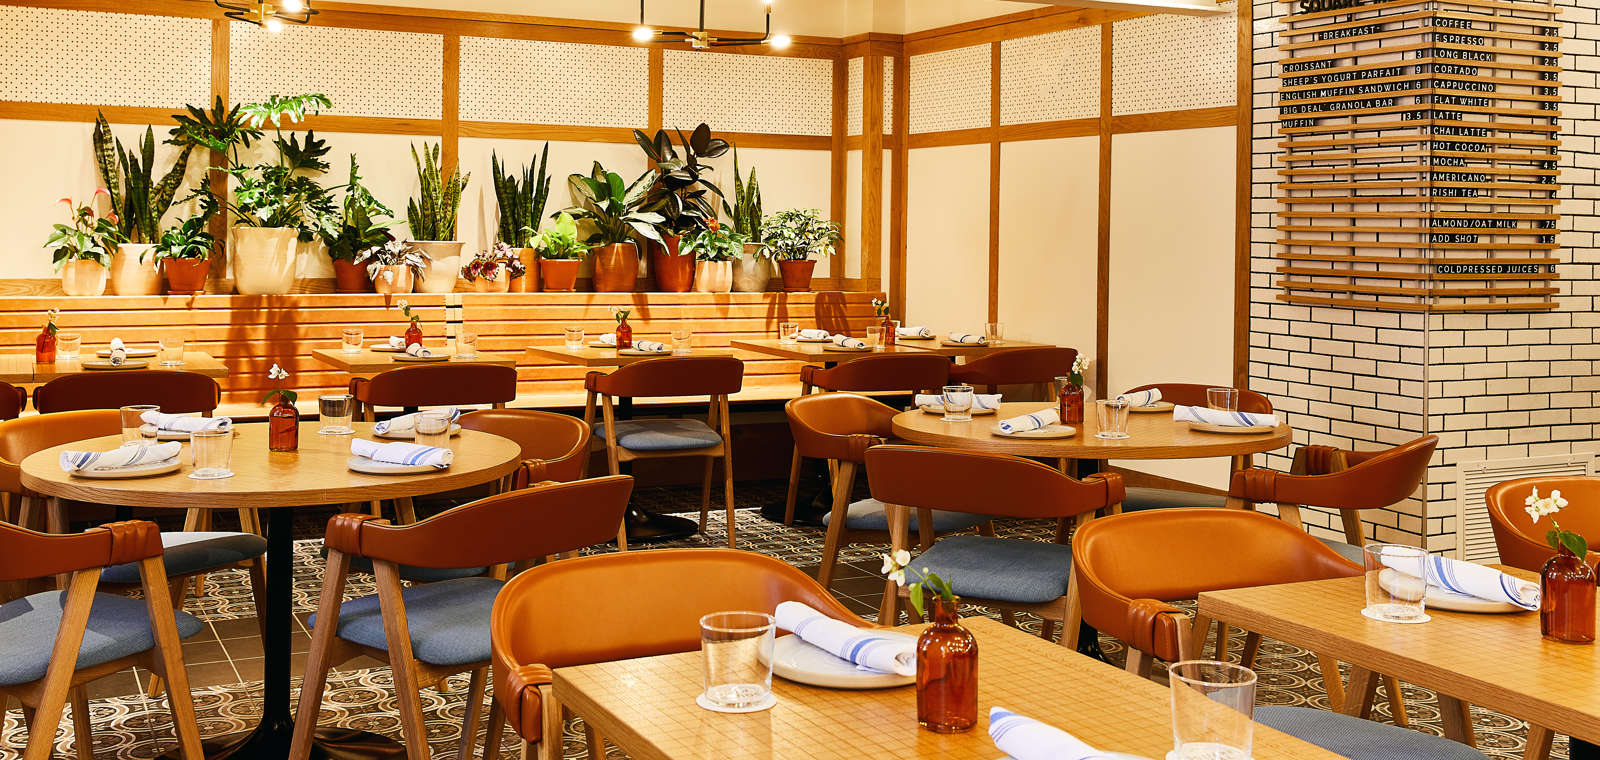 Revival_Restaurant_Square Meal3